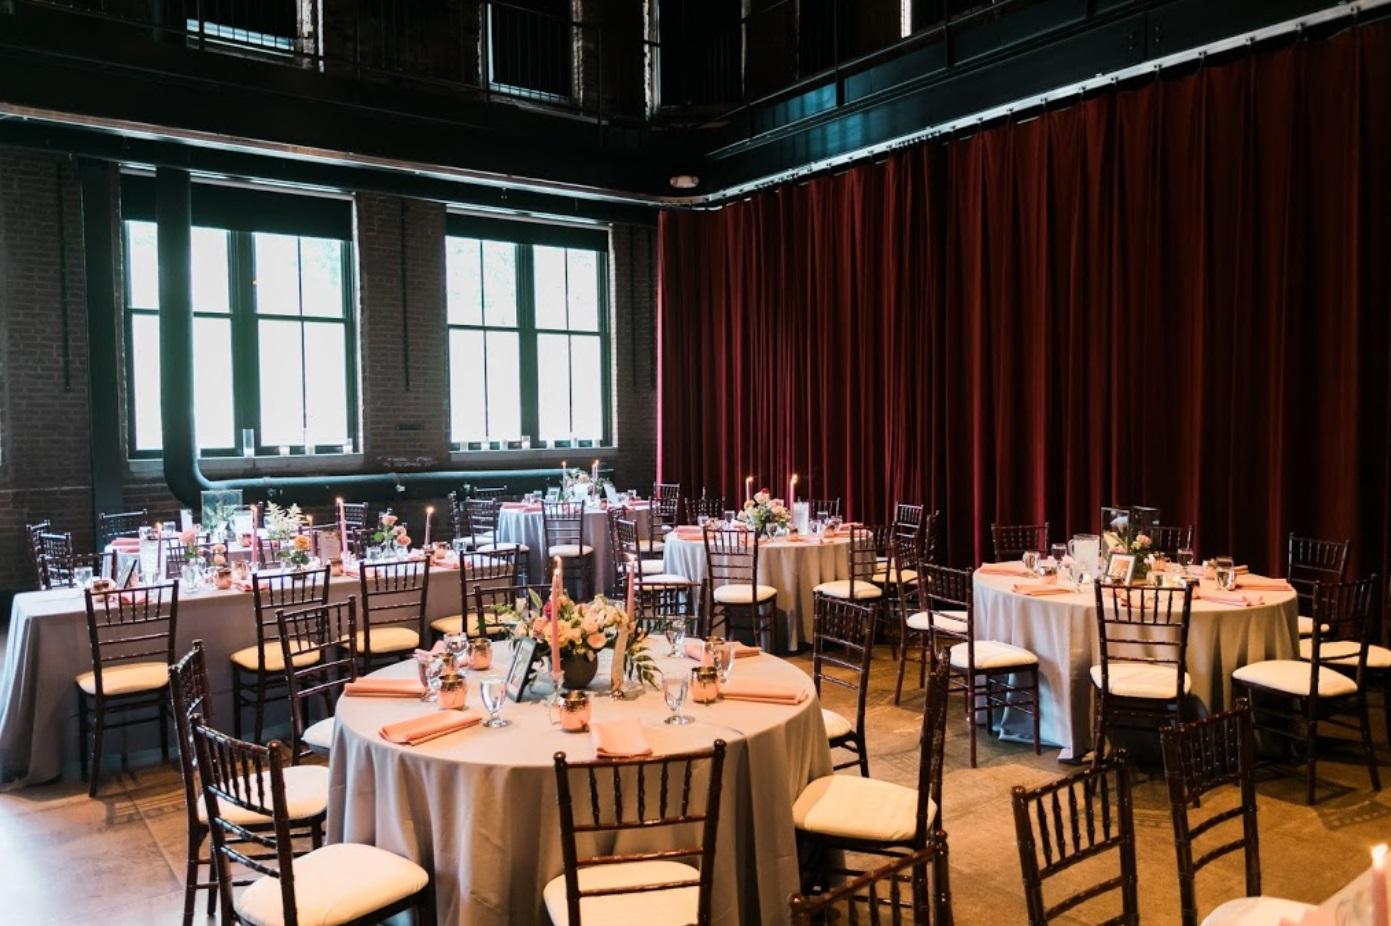 Pittsburgh Opera House_Nicole Englert74.jpg